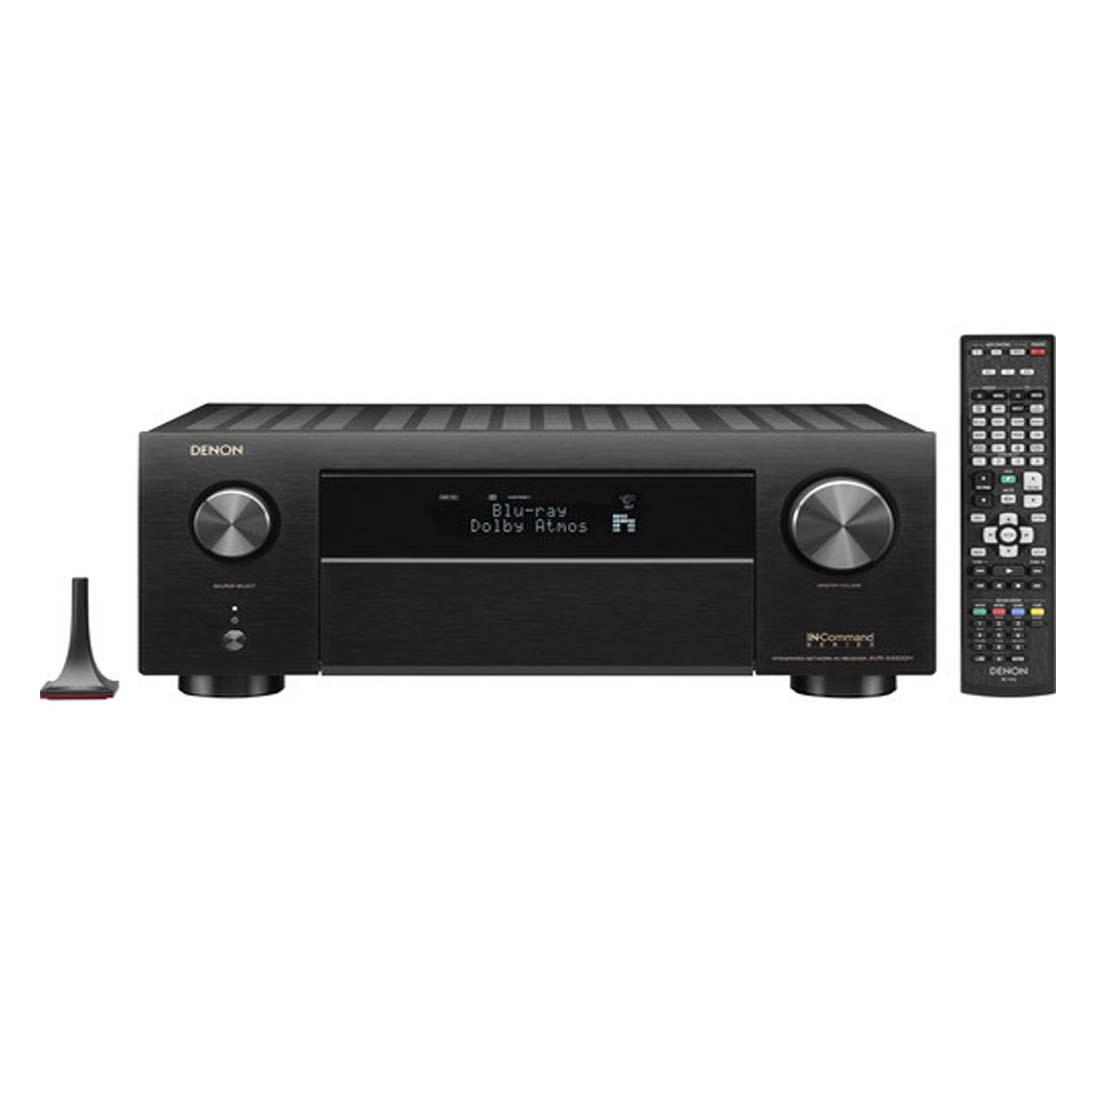 Denon AVR-X4500H 9 2-Channel Network A/V Receiver